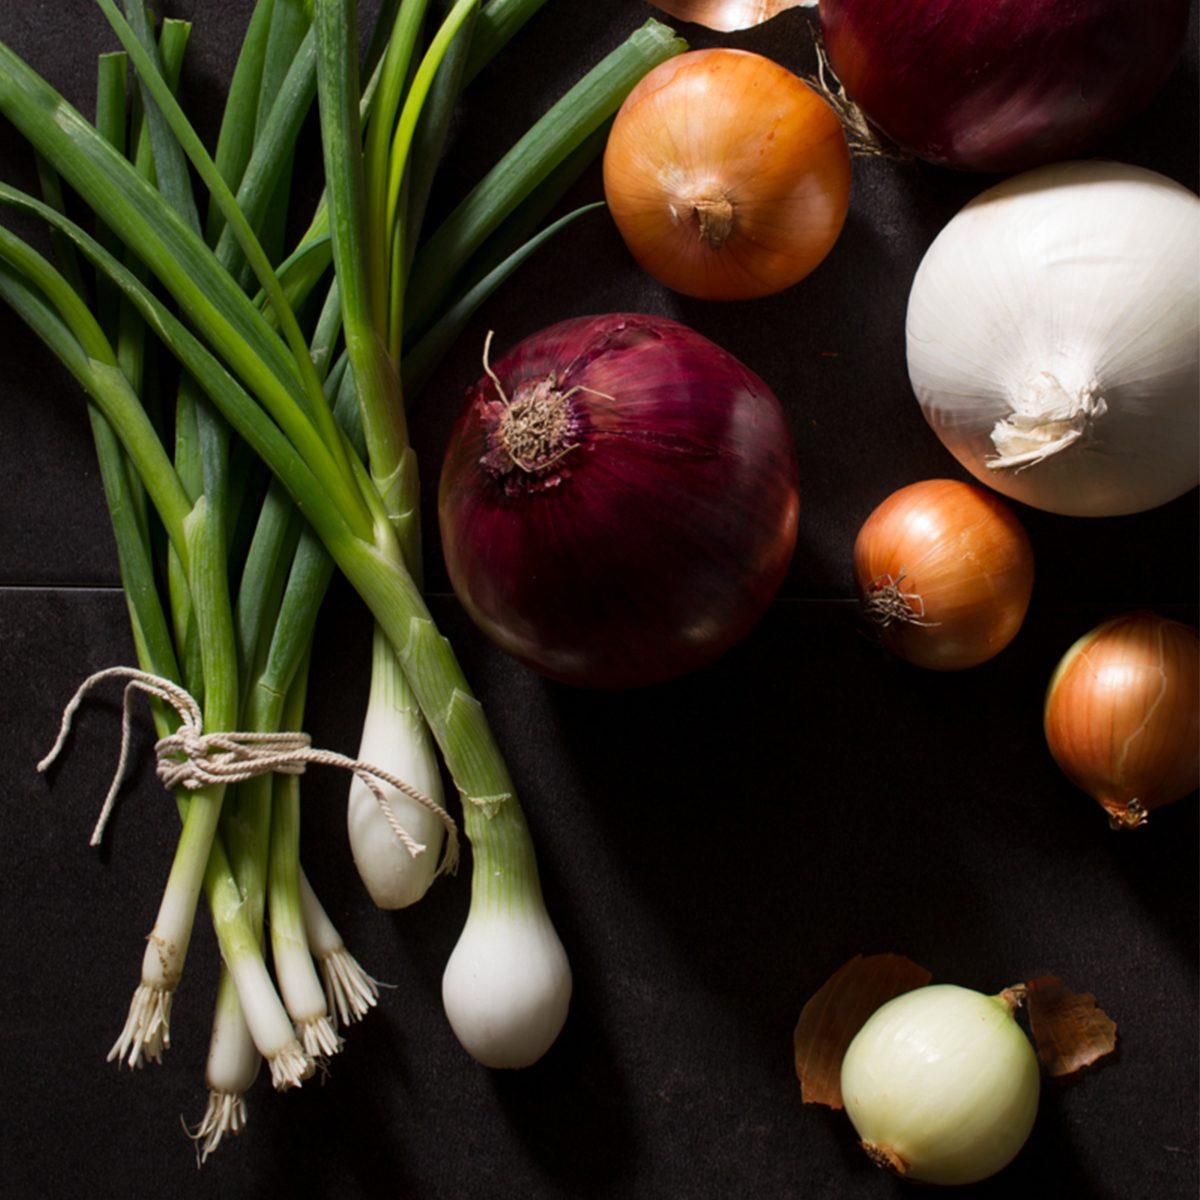 Onions via Taste of Home